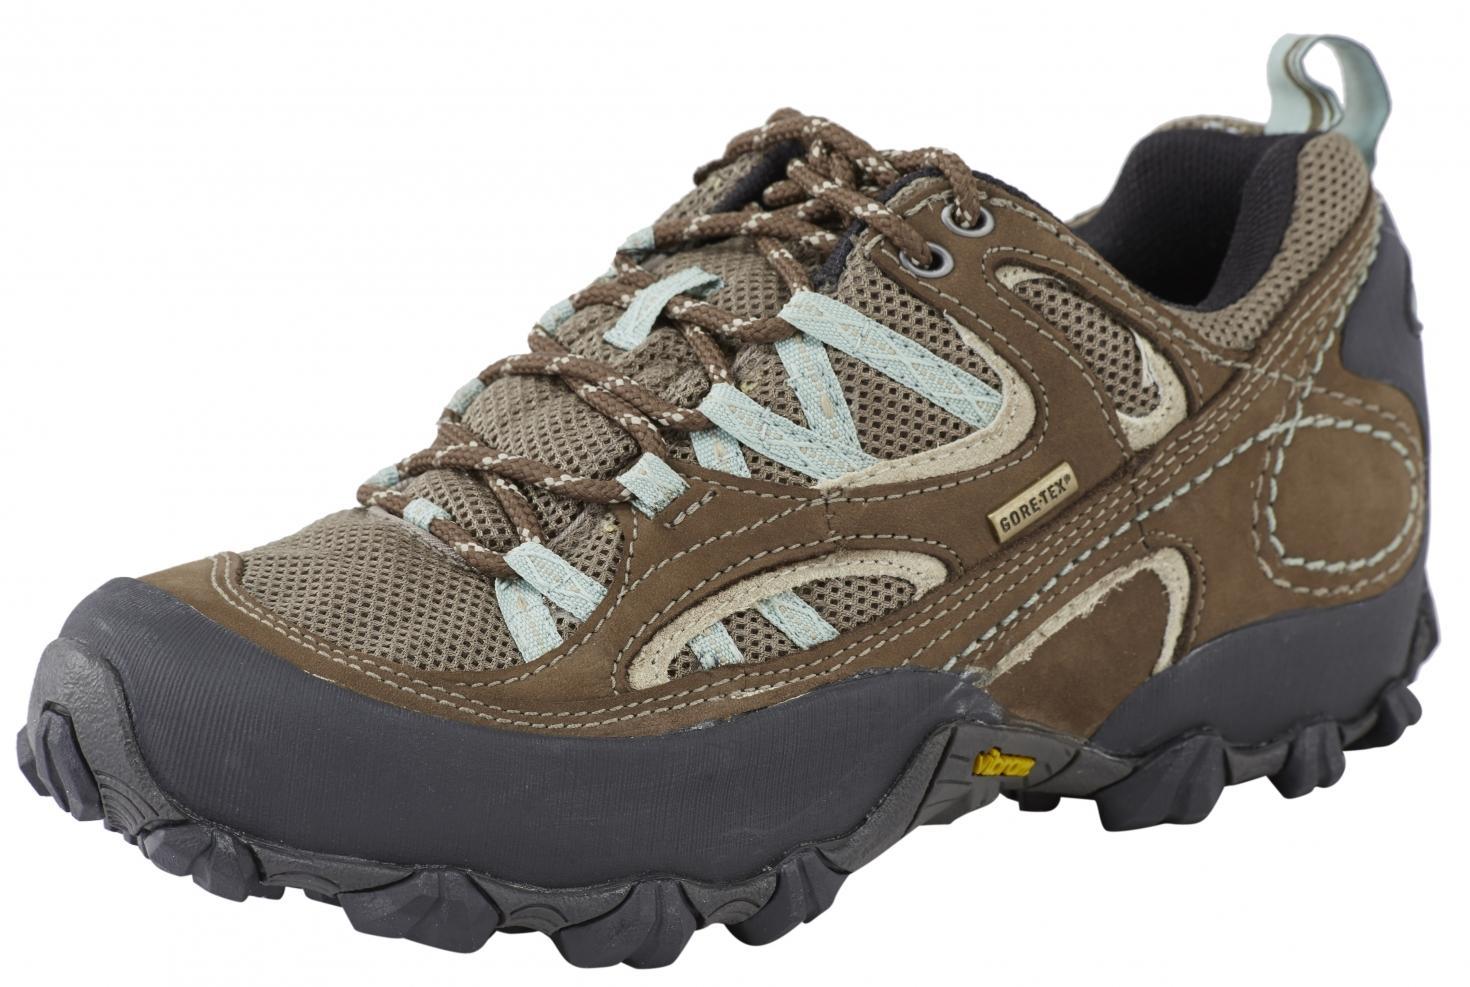 Chaussures de trekking femme  Patagonia Drifter GoreTex et Vibram (du 36.5 au 38.5)